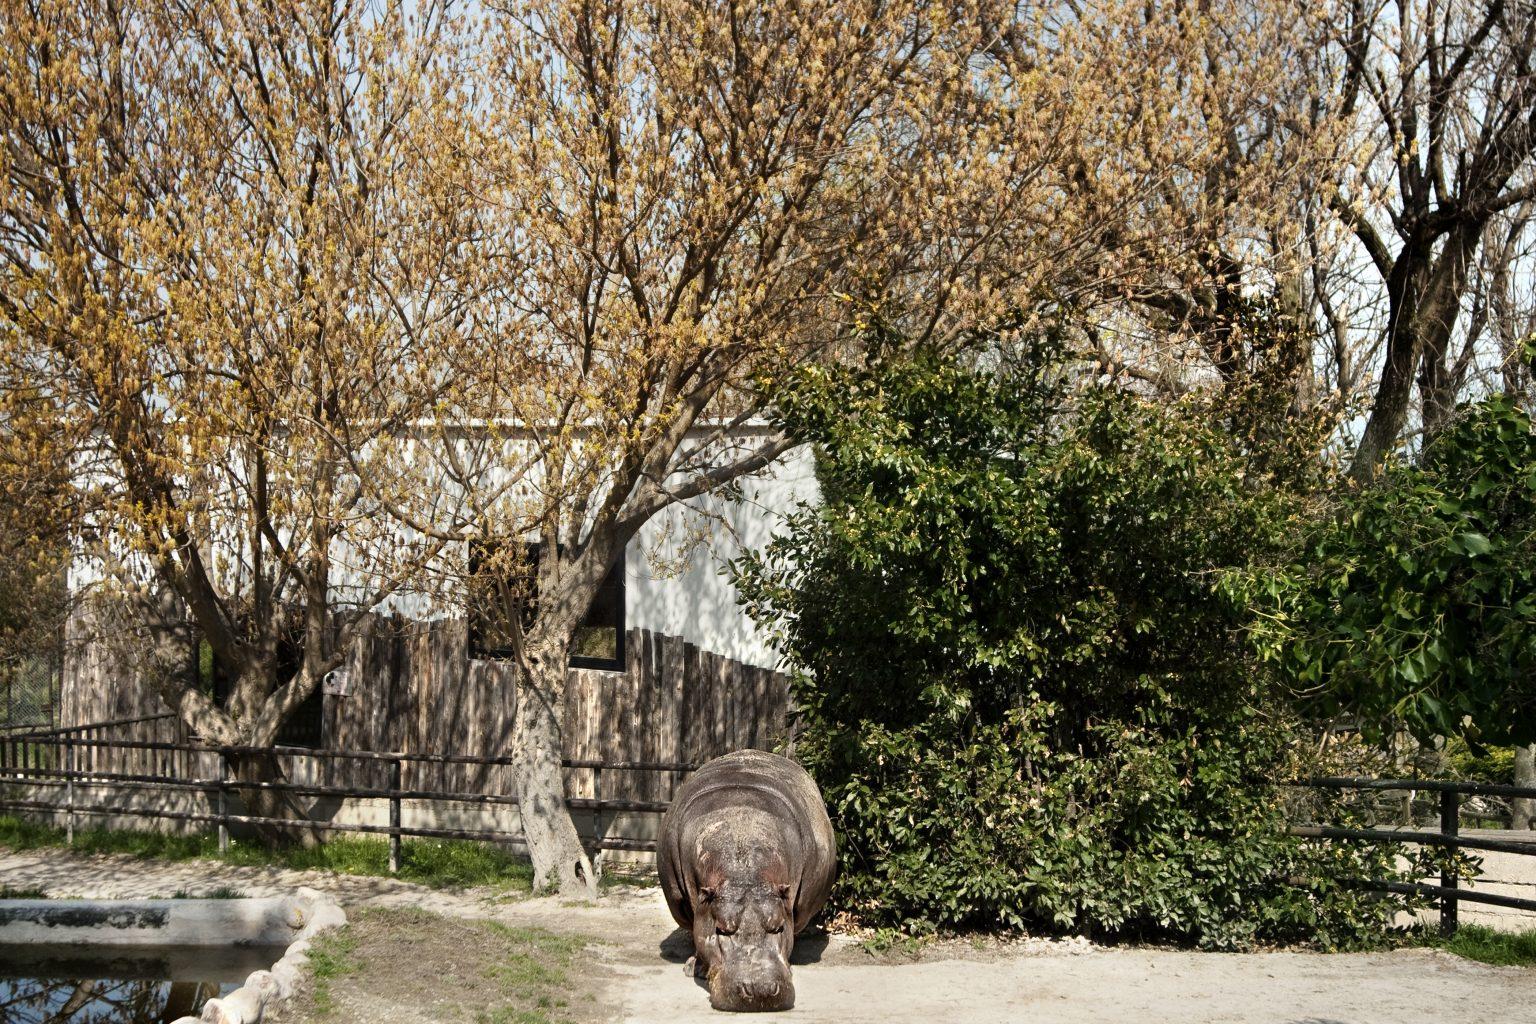 Falconara Marittima (Ancona - Italy), March 2012 - Parco Zoo Falconara (zoological garden), hippopotamus. >< Falconara Marittima (Ancona ), marzo 2012 - Parco Zoo Falconara (giardino zoologico), ippopotamo.